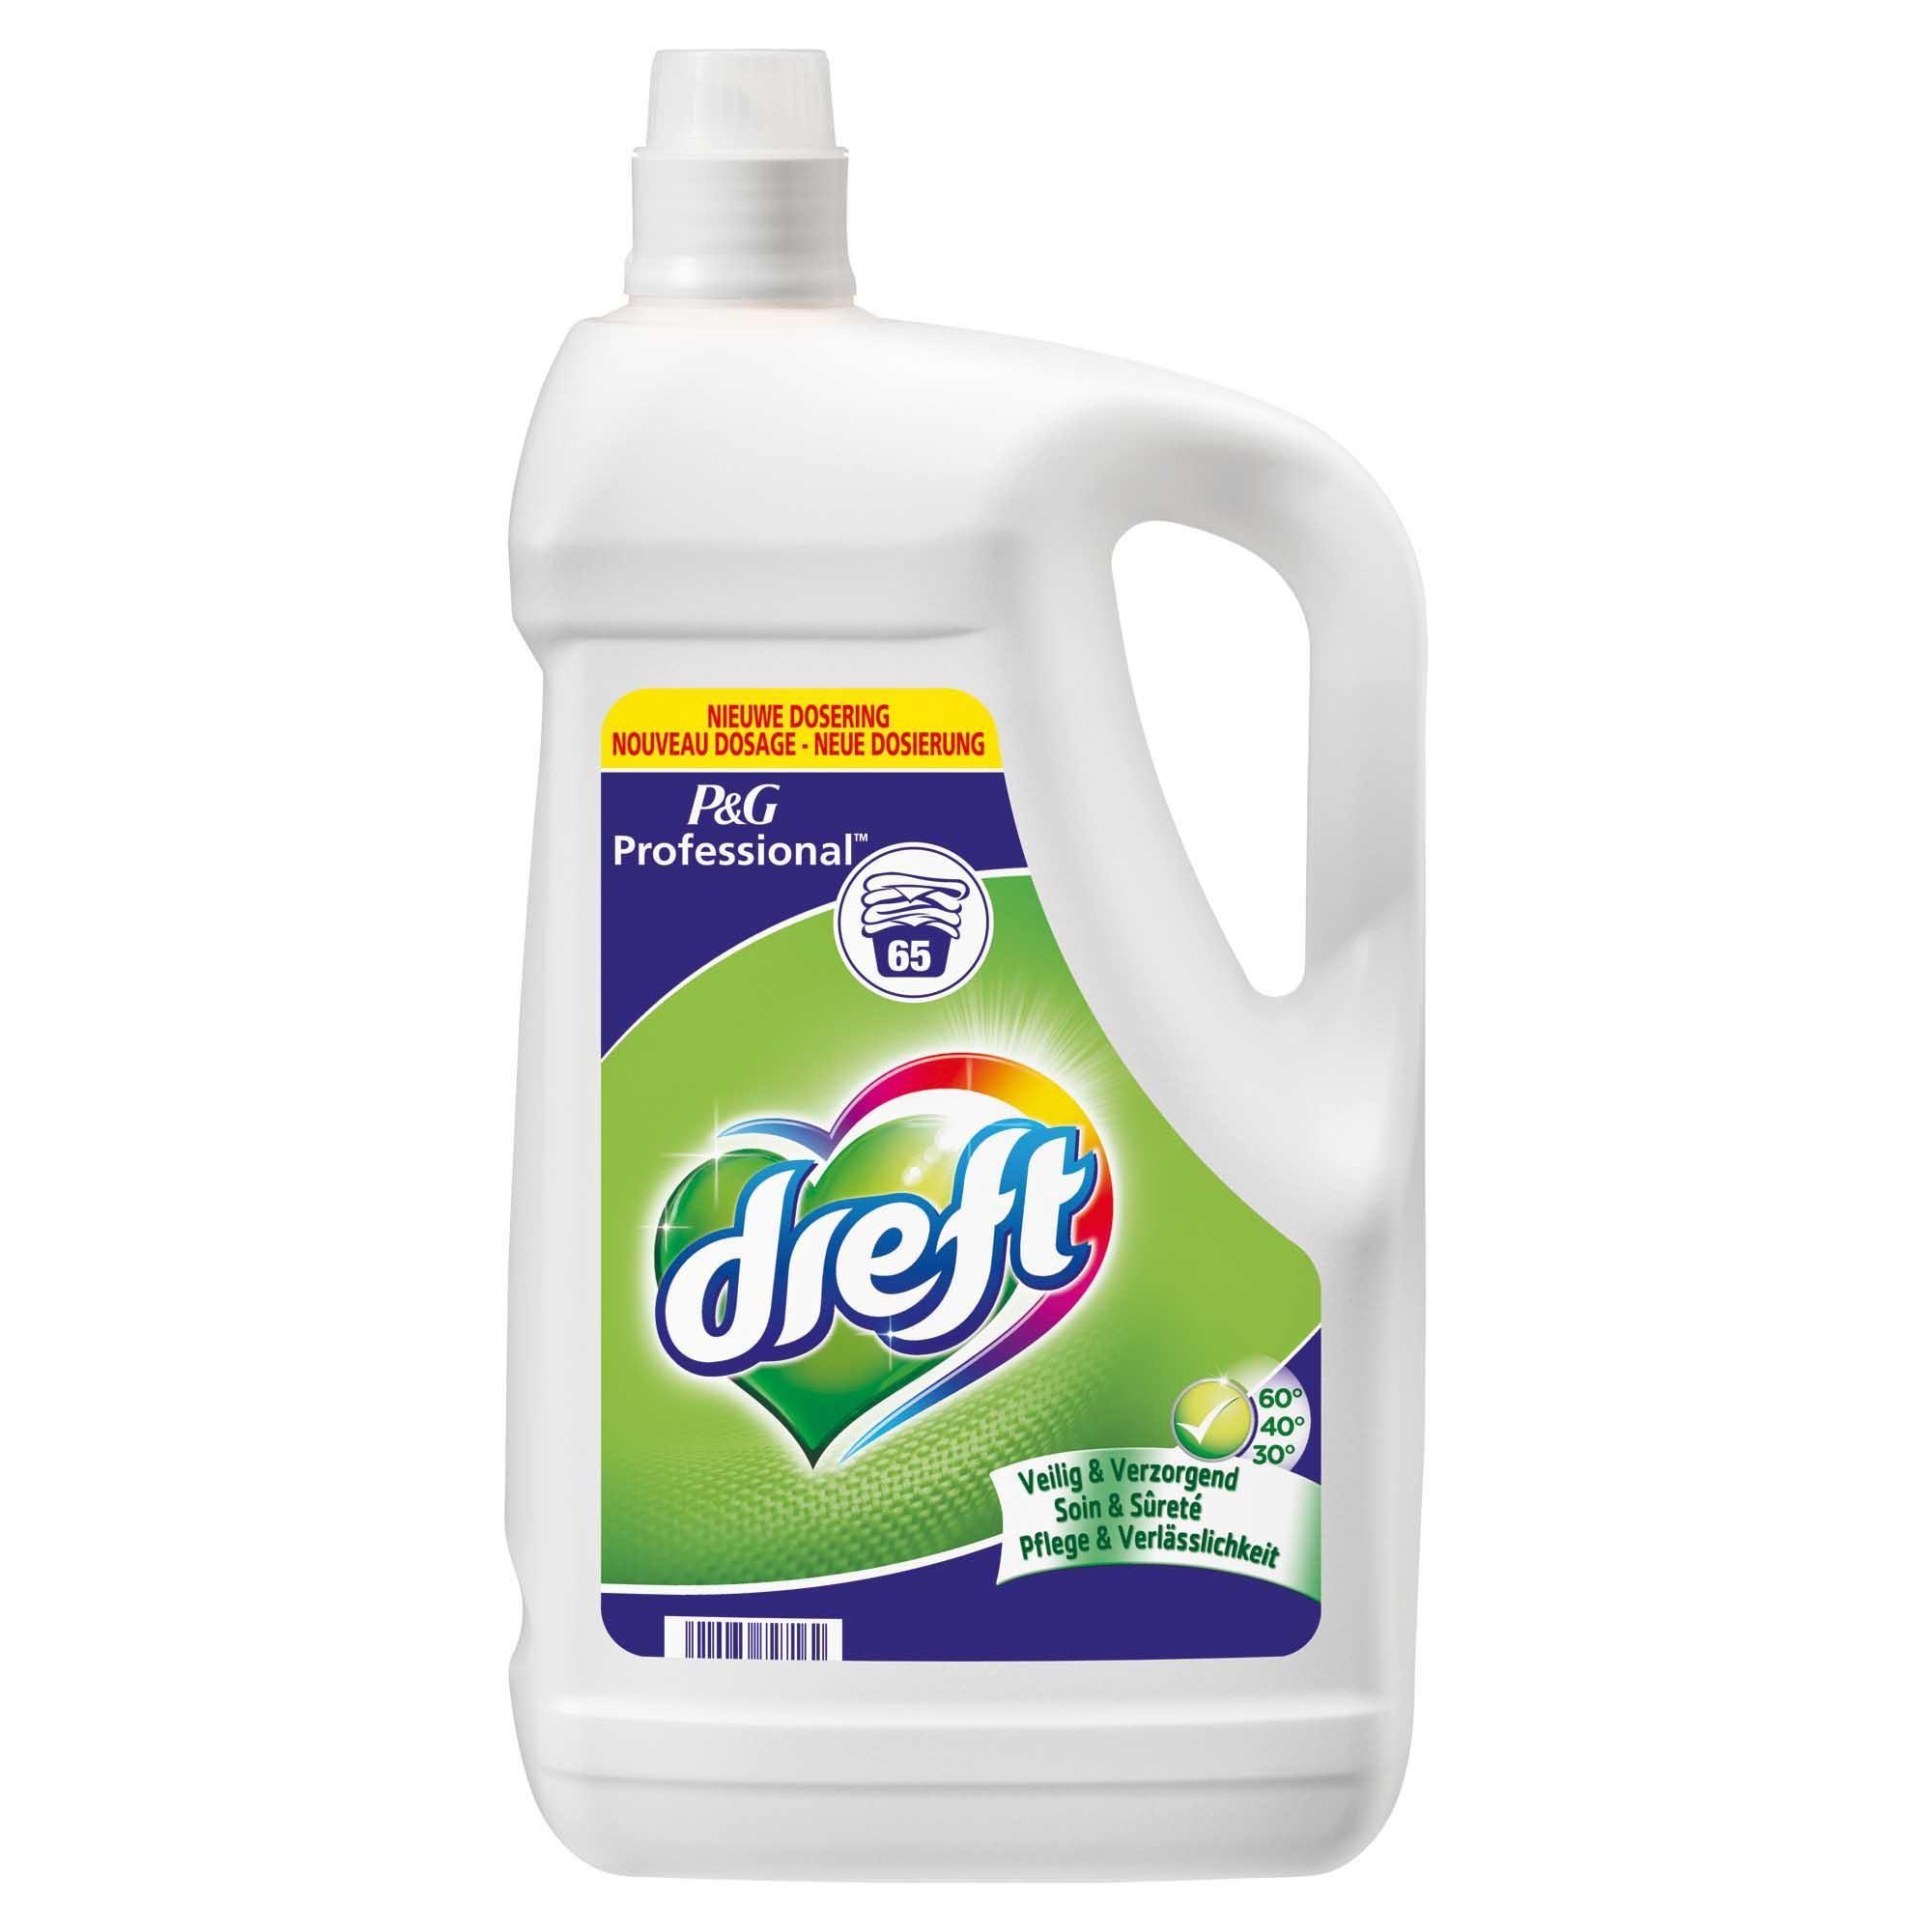 Dreft 83sc lessive delicat liquide 4.565L Professionel